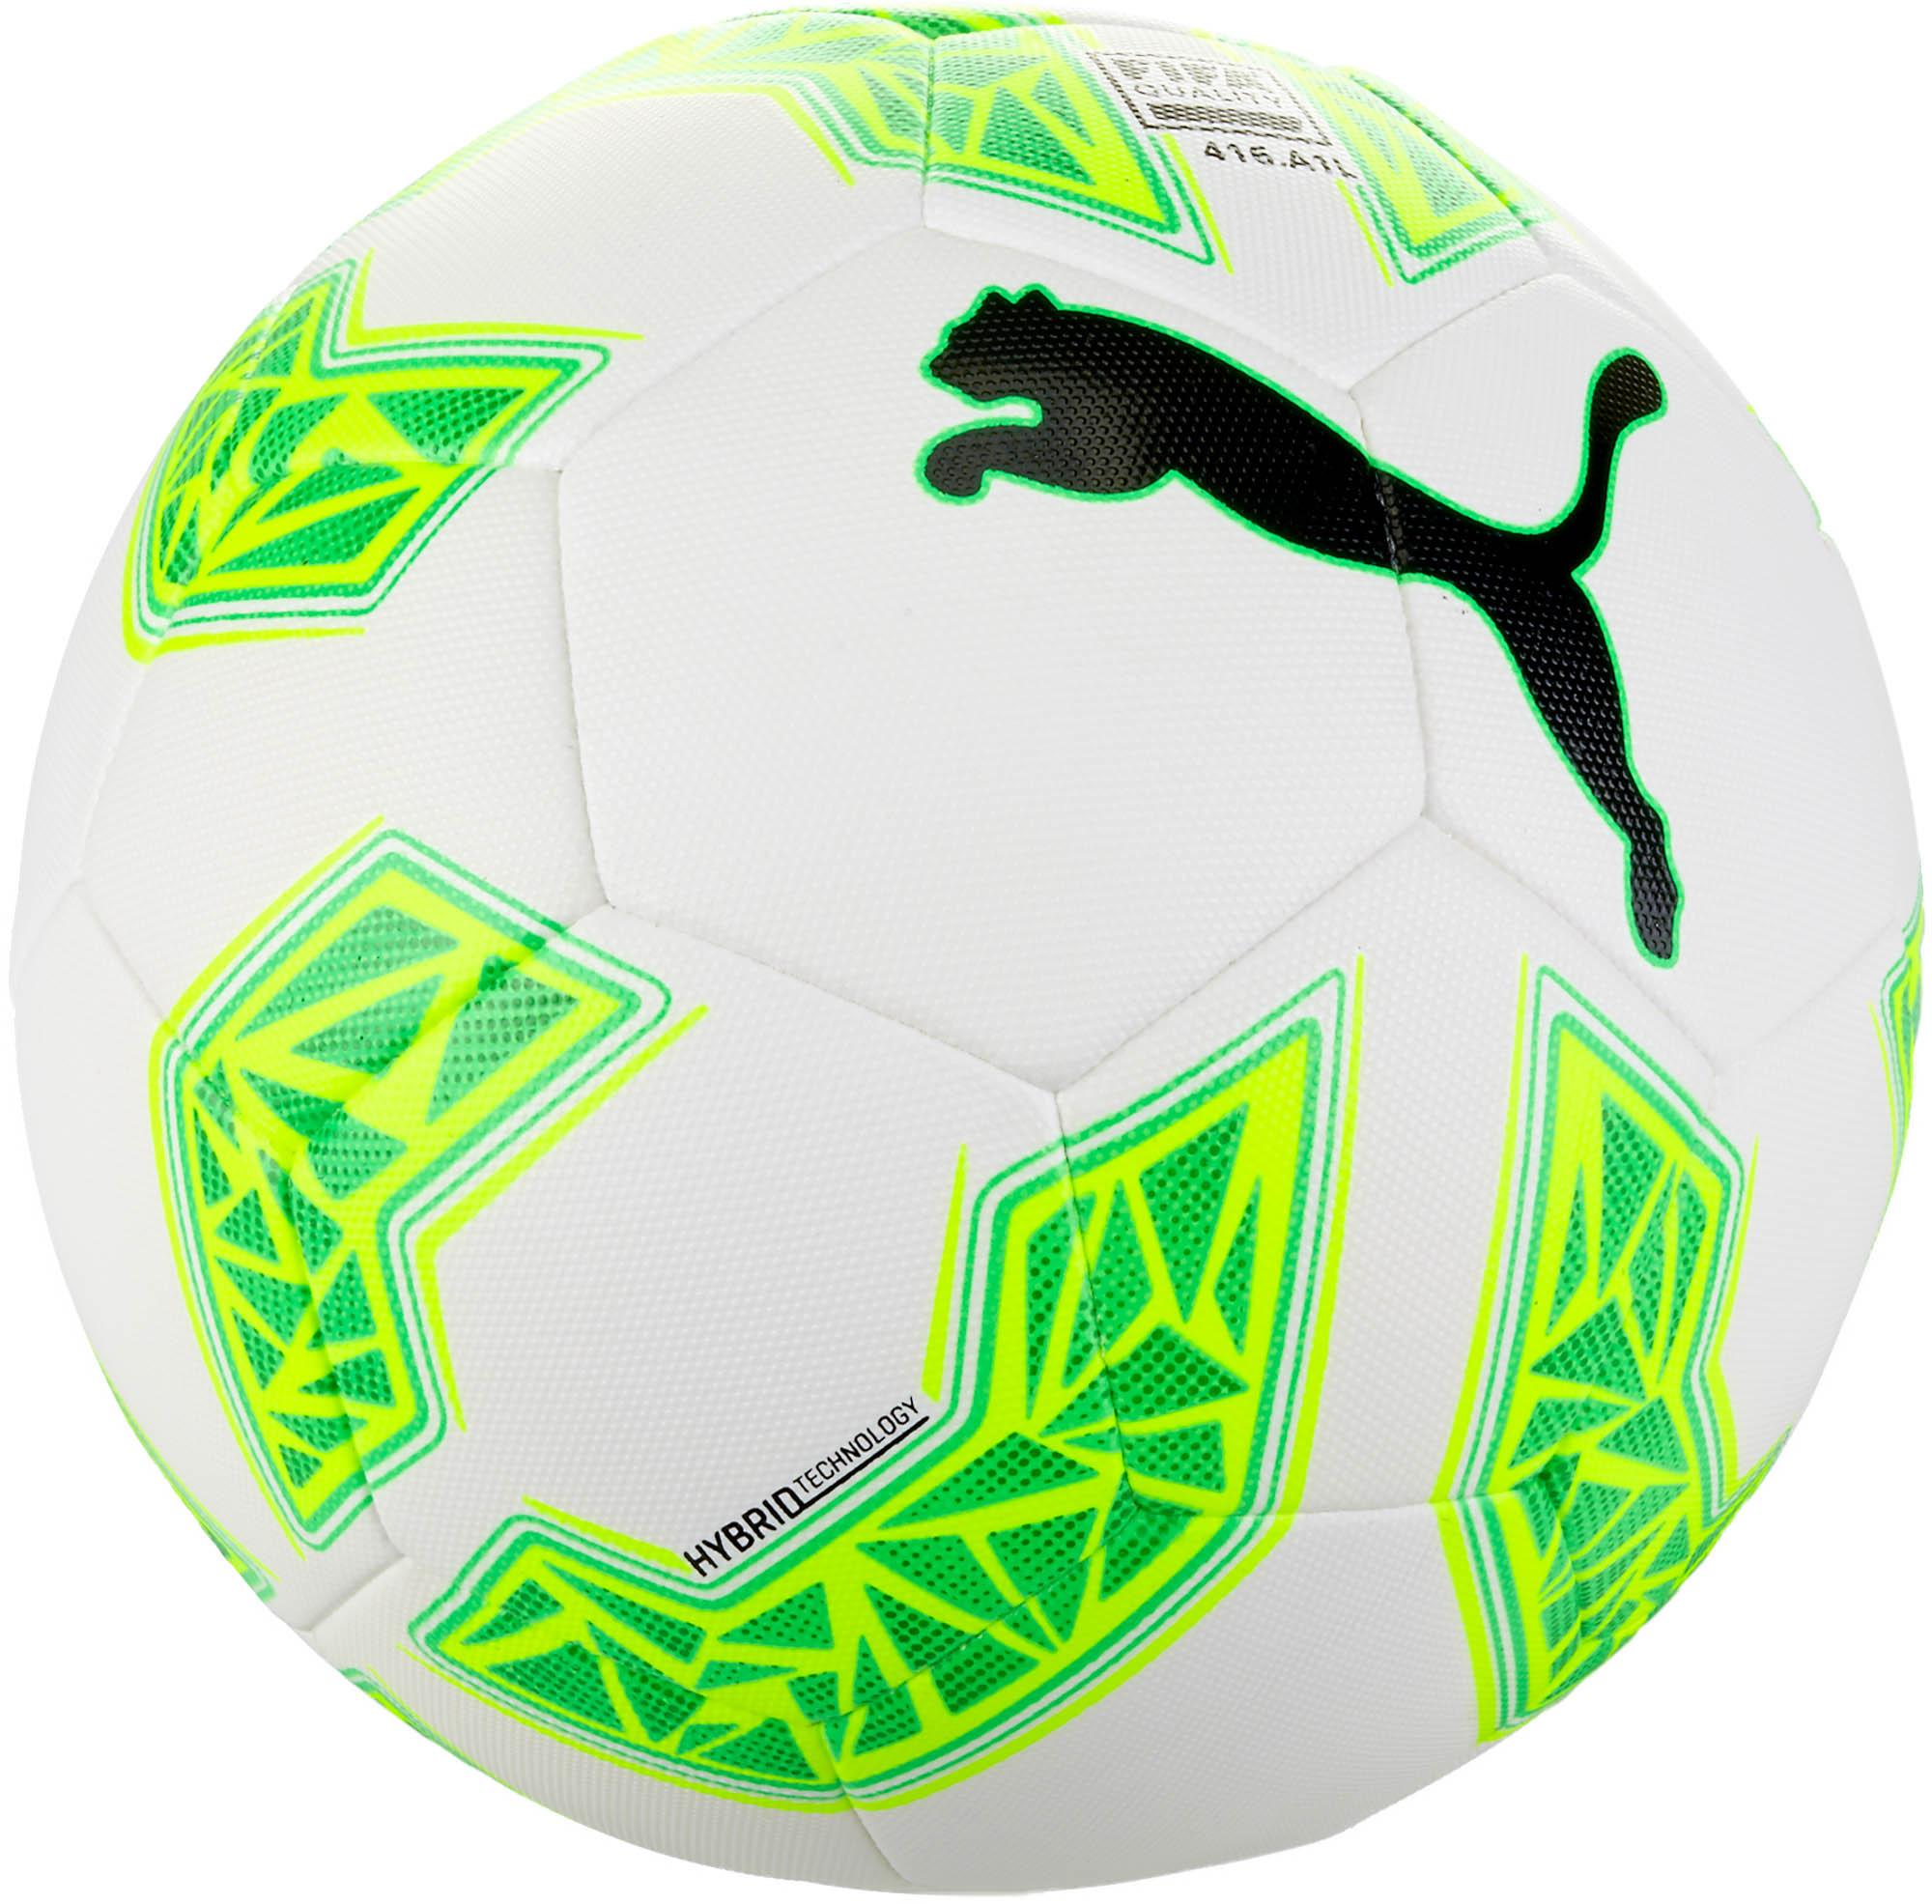 1550d4831b23 PUMA evoSPEED 2.5 Hybrid Soccer Ball – White Green Gecko